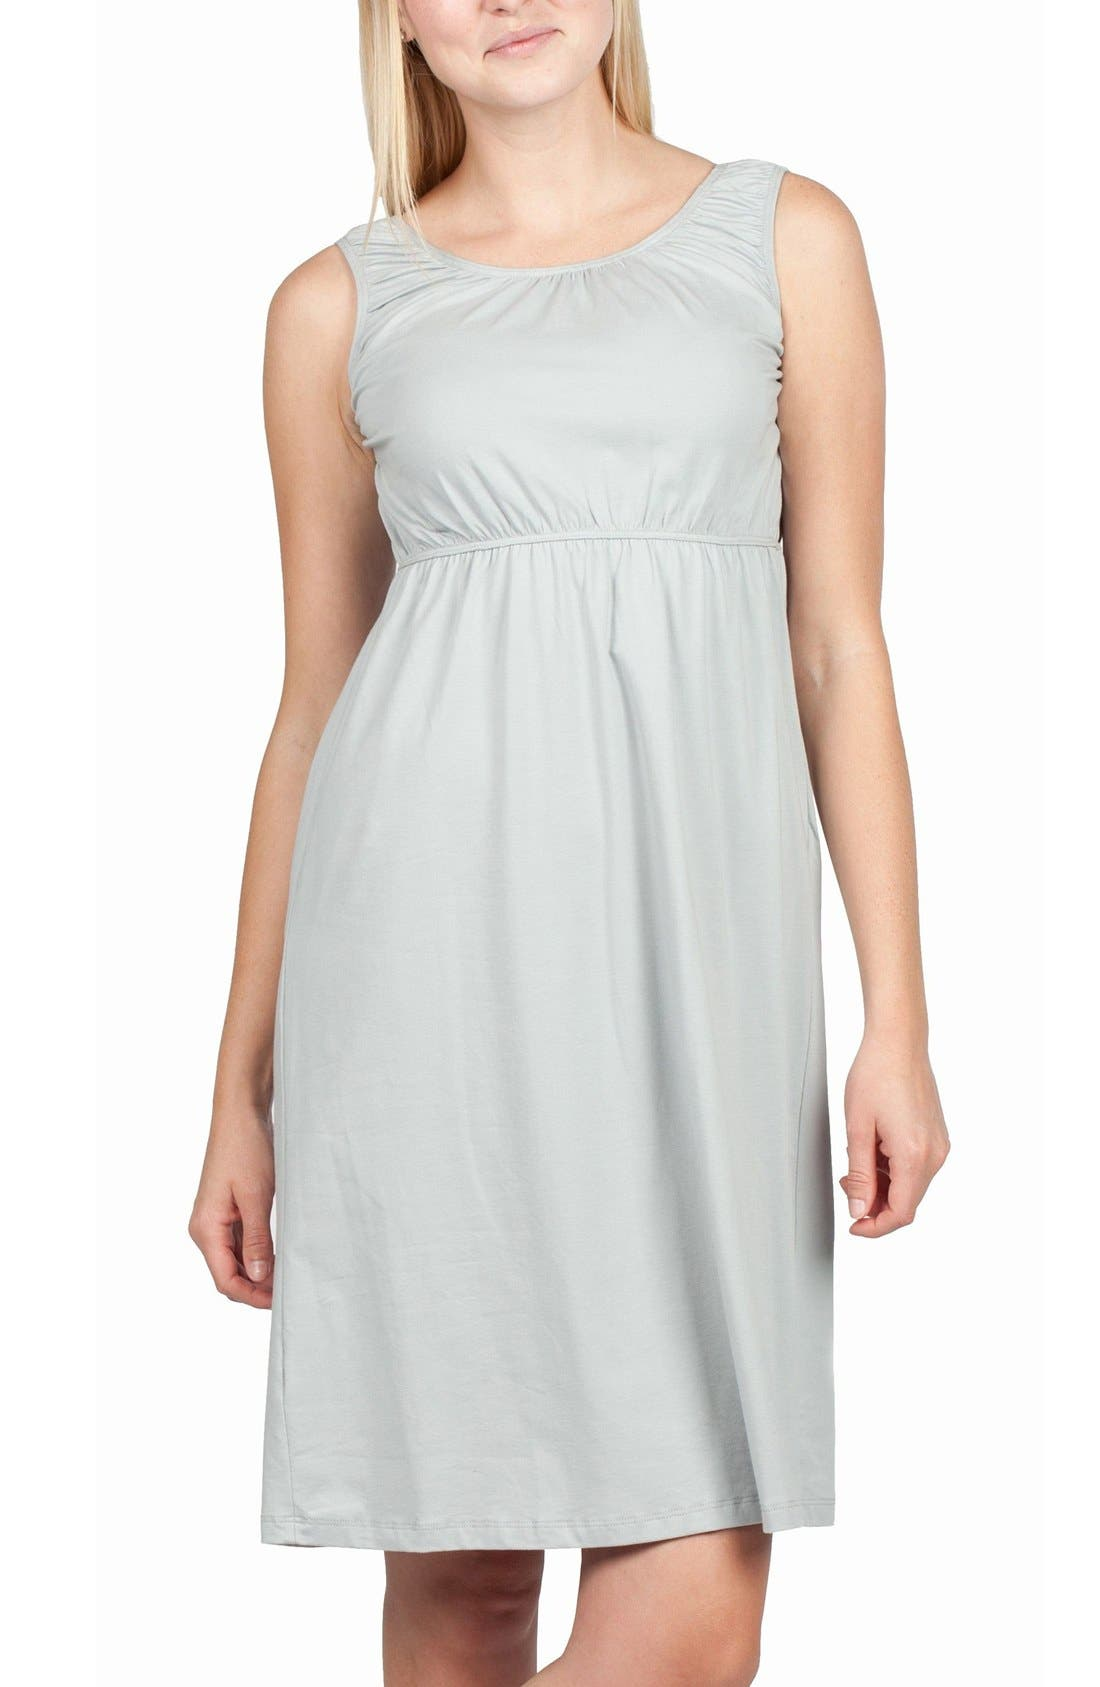 Savi Mom Oxford Maternity/Nursing Nightgown